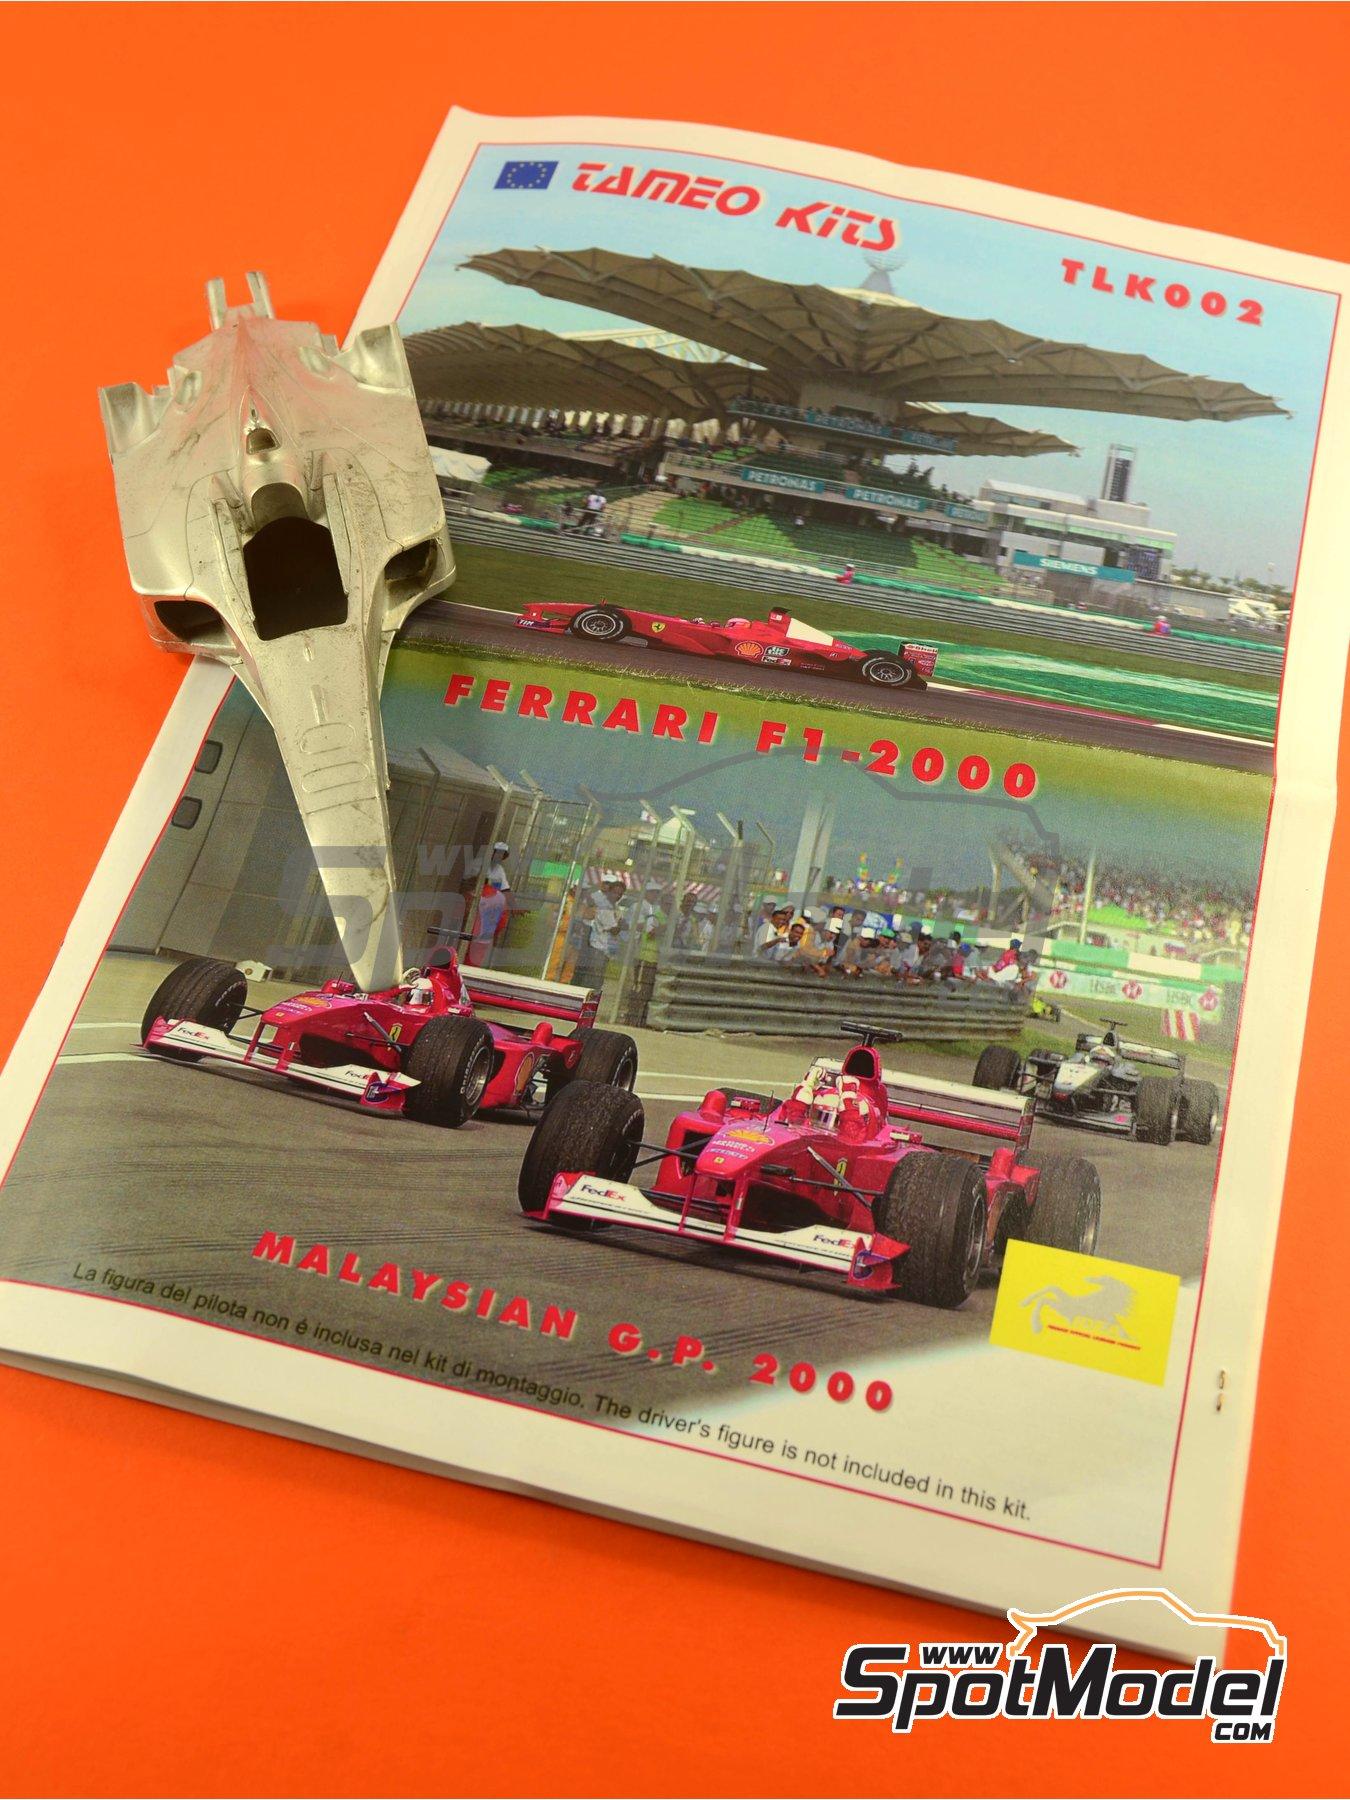 Ferrari F1 2000 Marlboro - Gran Premio de Fórmula 1 de Malasia 2000 | Maqueta de coche en escala1/24 fabricado por Tameo Kits (ref.TLK002) image